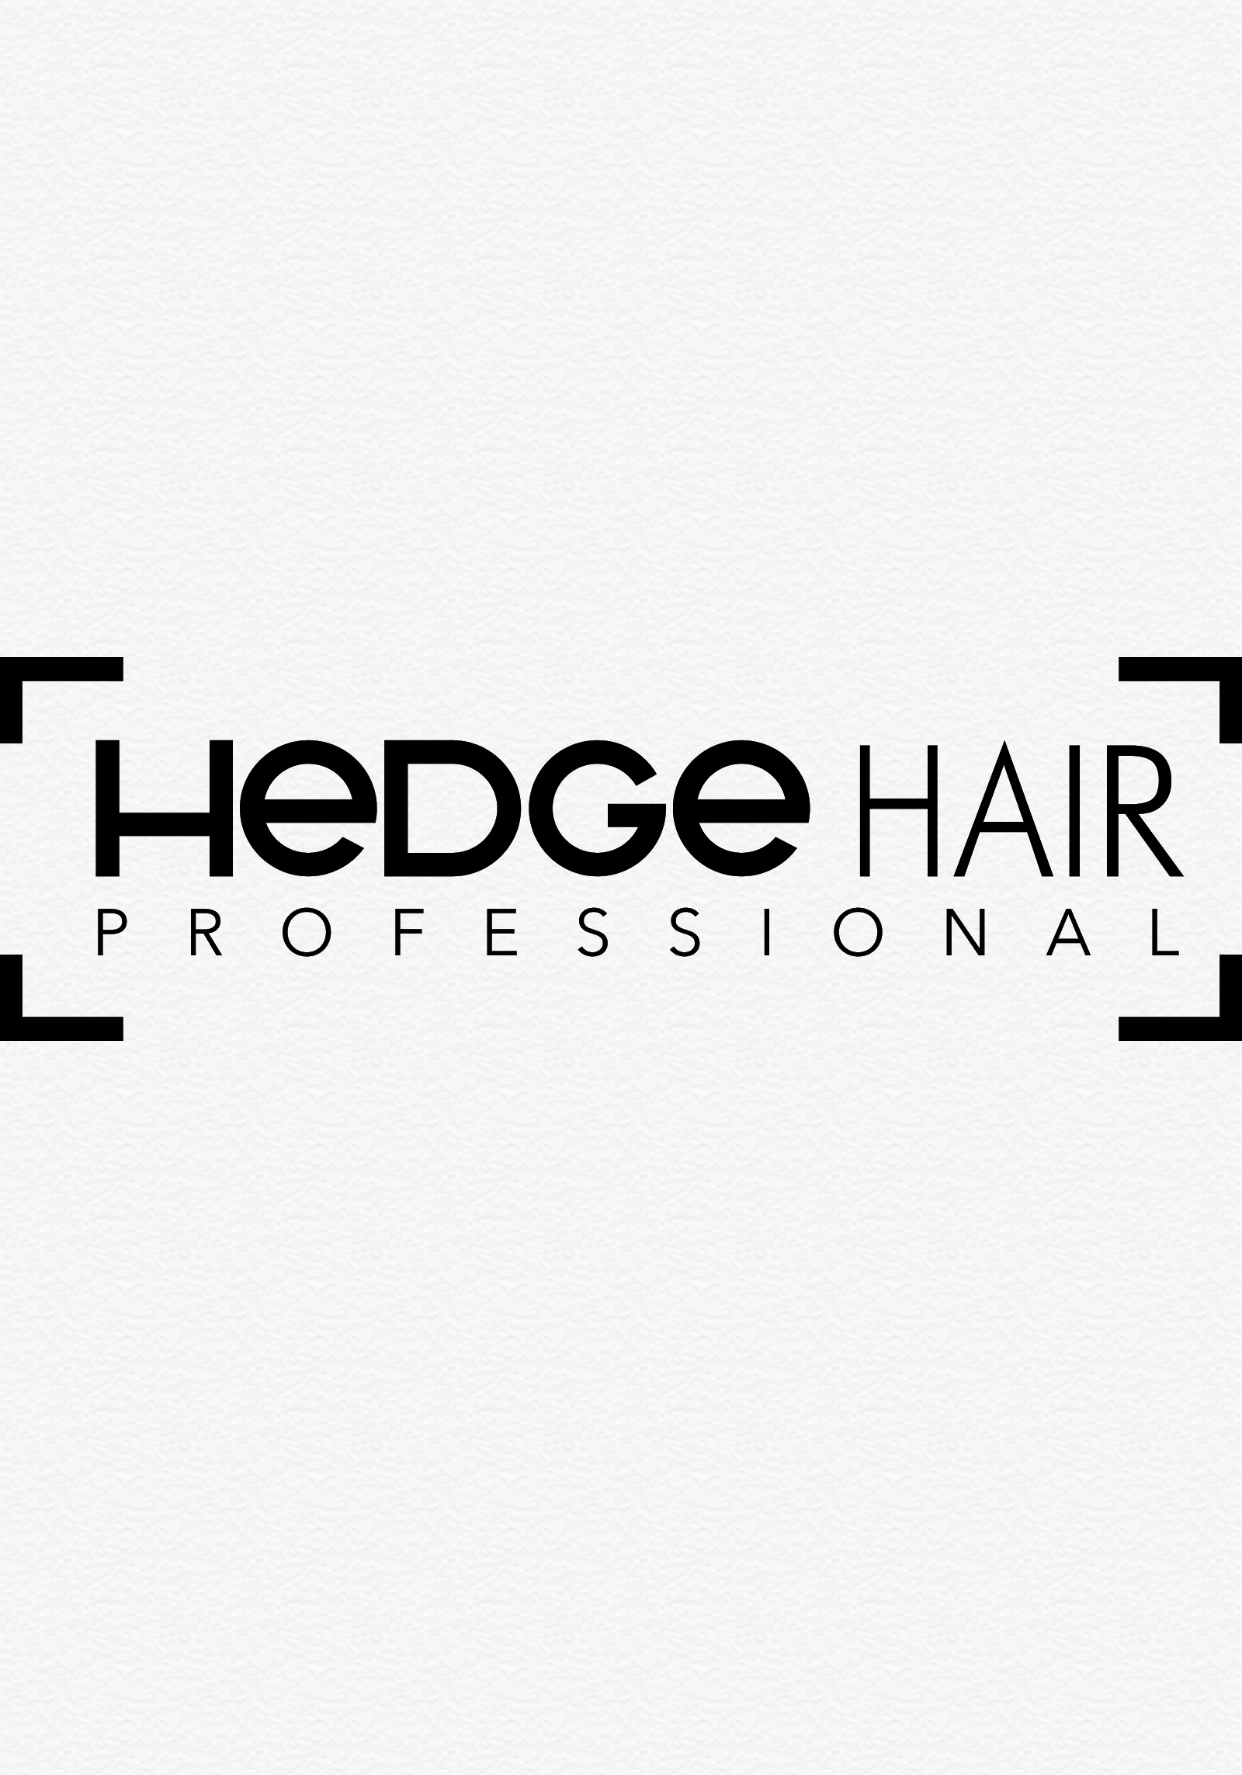 HEDGE HAIR - Fodrászat